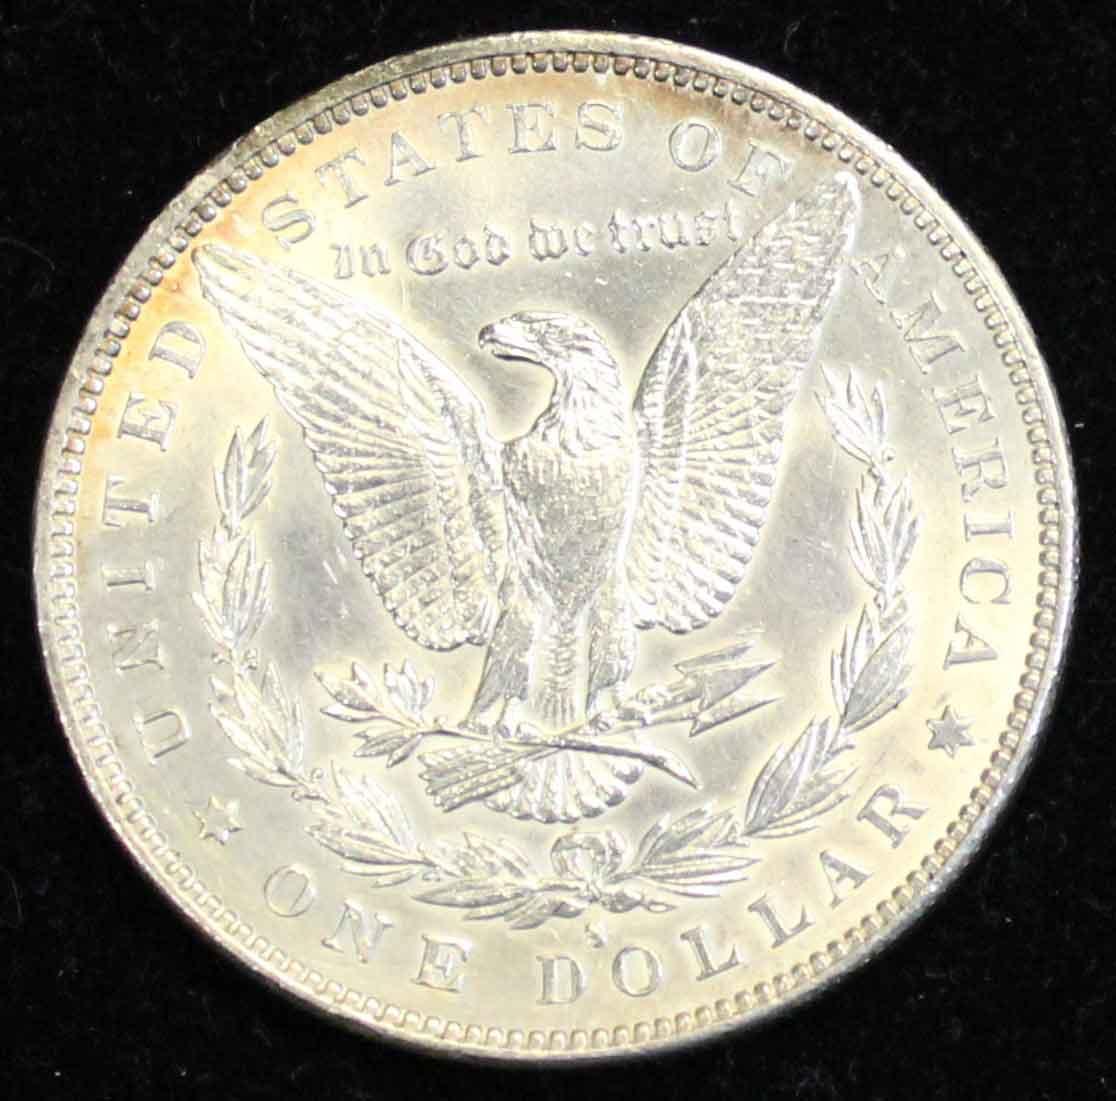 1889 Morgan Dollar has an embossed mintmark